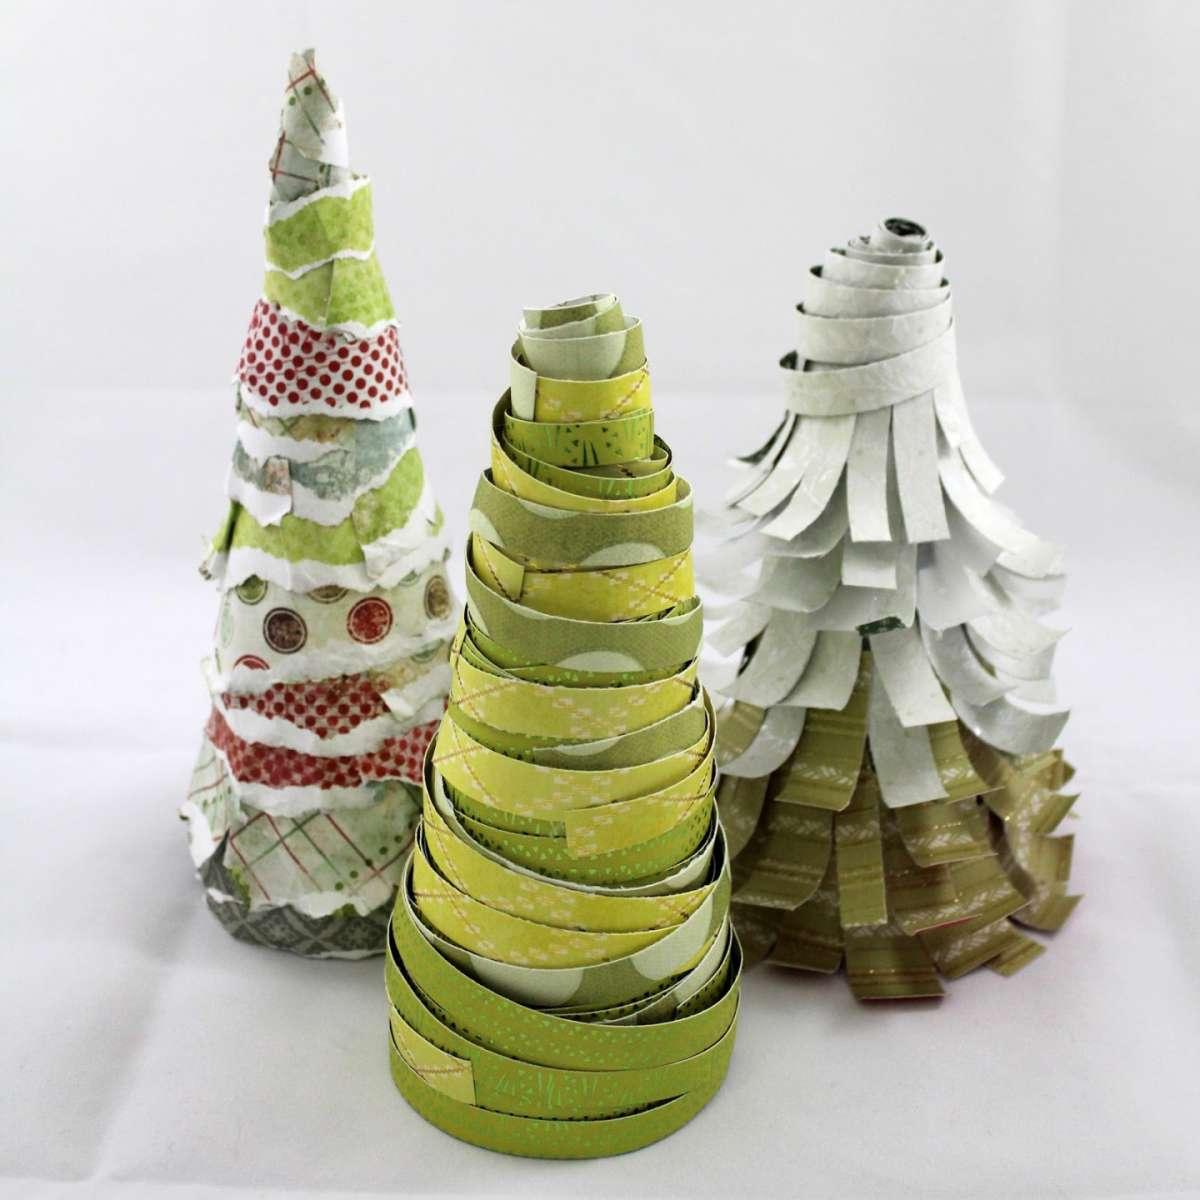 Alberi Di Natale Di Carta.Alberi Di Natale Di Carta Dal Giornale Agli Origami Originali Pourfemme